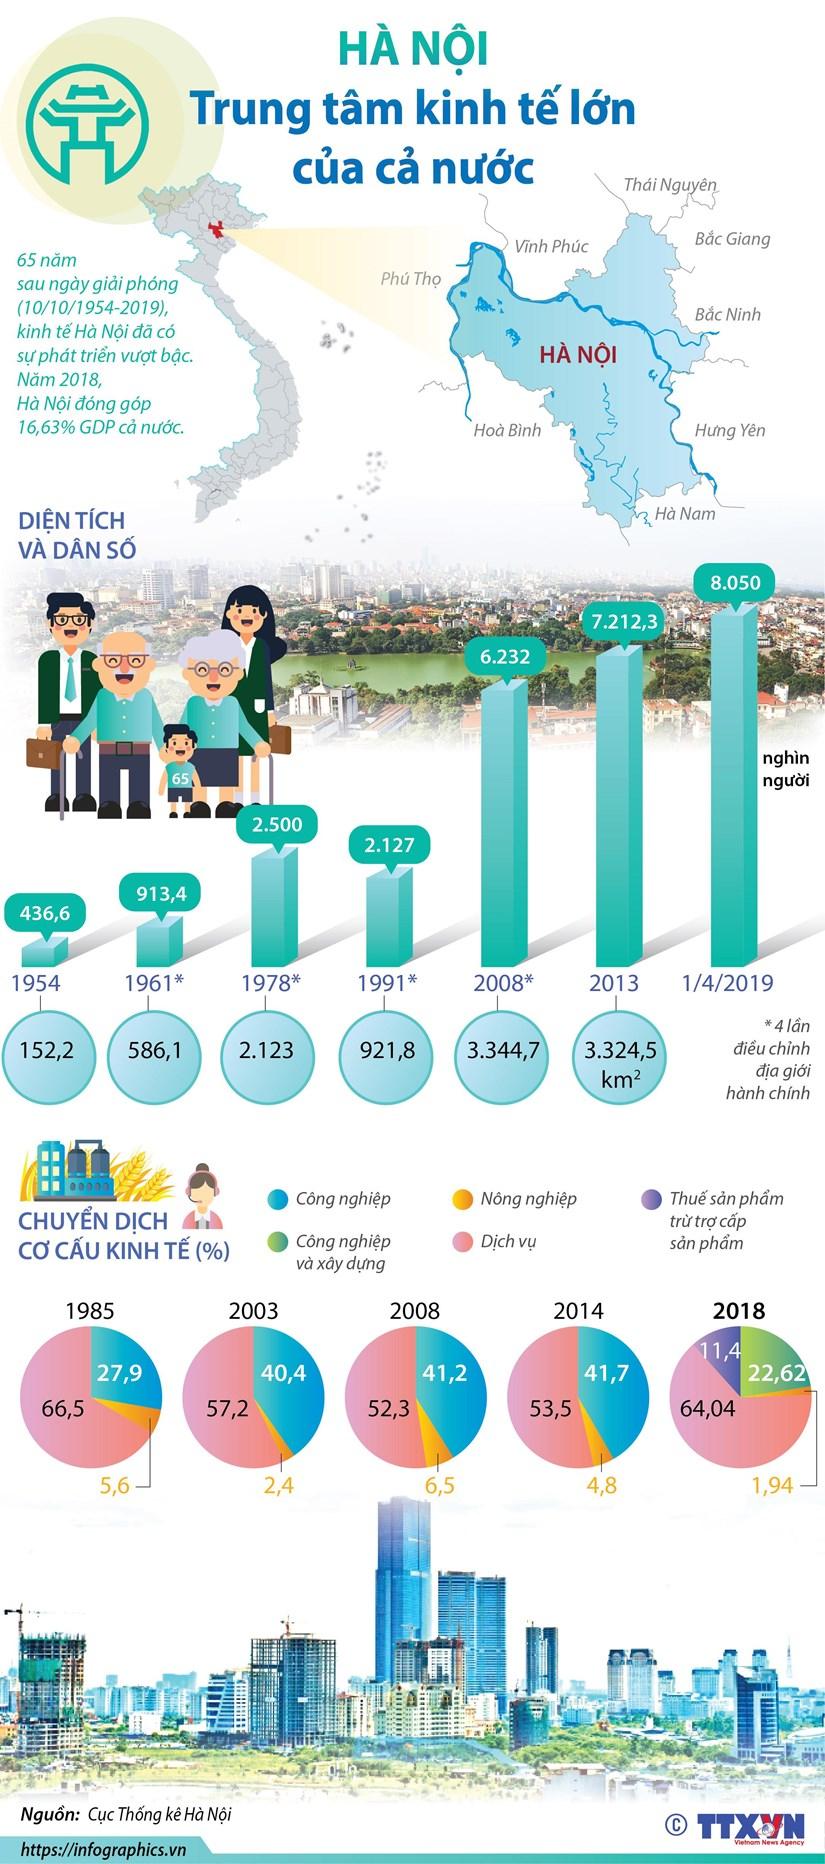 [Infographics] Ha Noi: Trung tam kinh te lon cua ca nuoc hinh anh 1